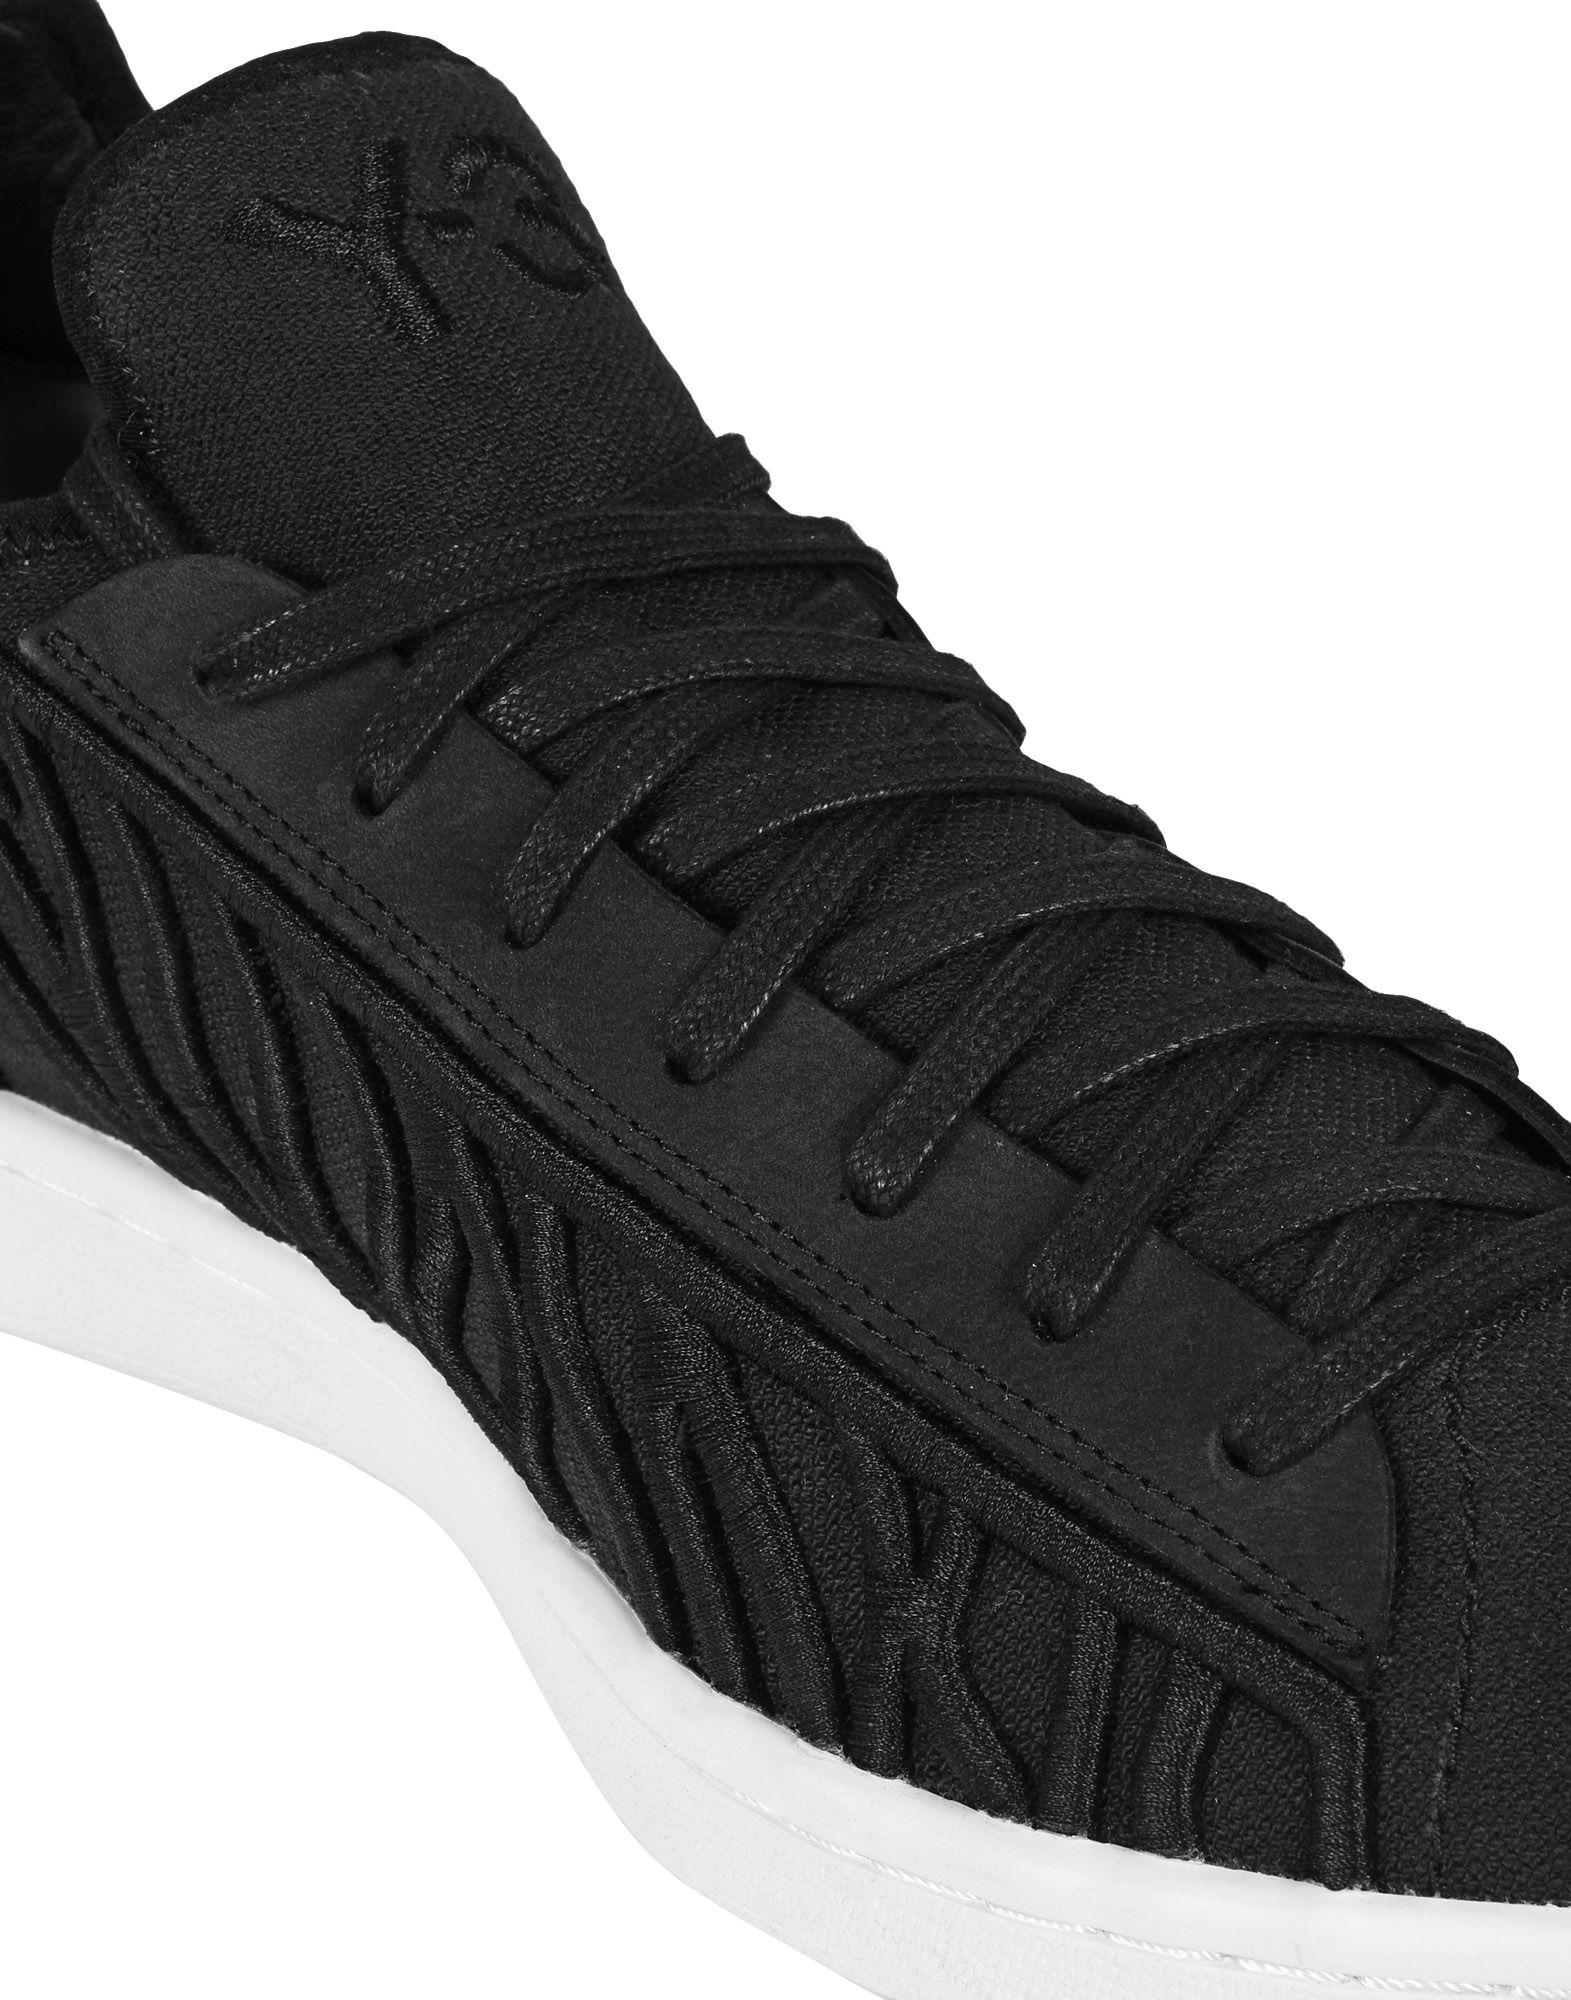 Y-3 Y-3 SHISHU STAN Sneakers Man a